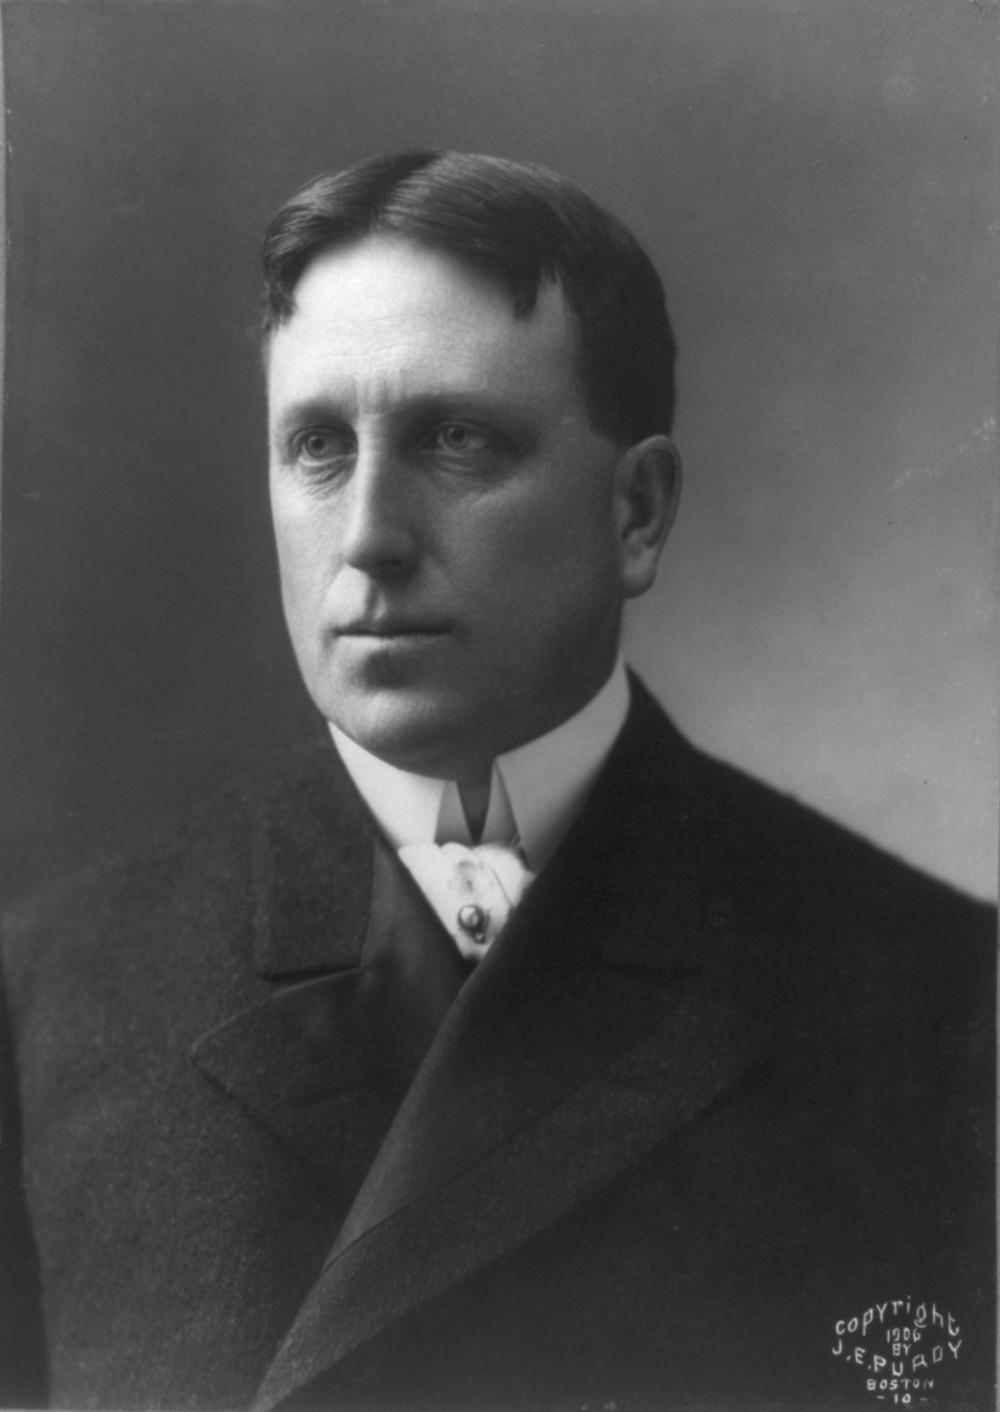 Copy of William Randolf Hearst